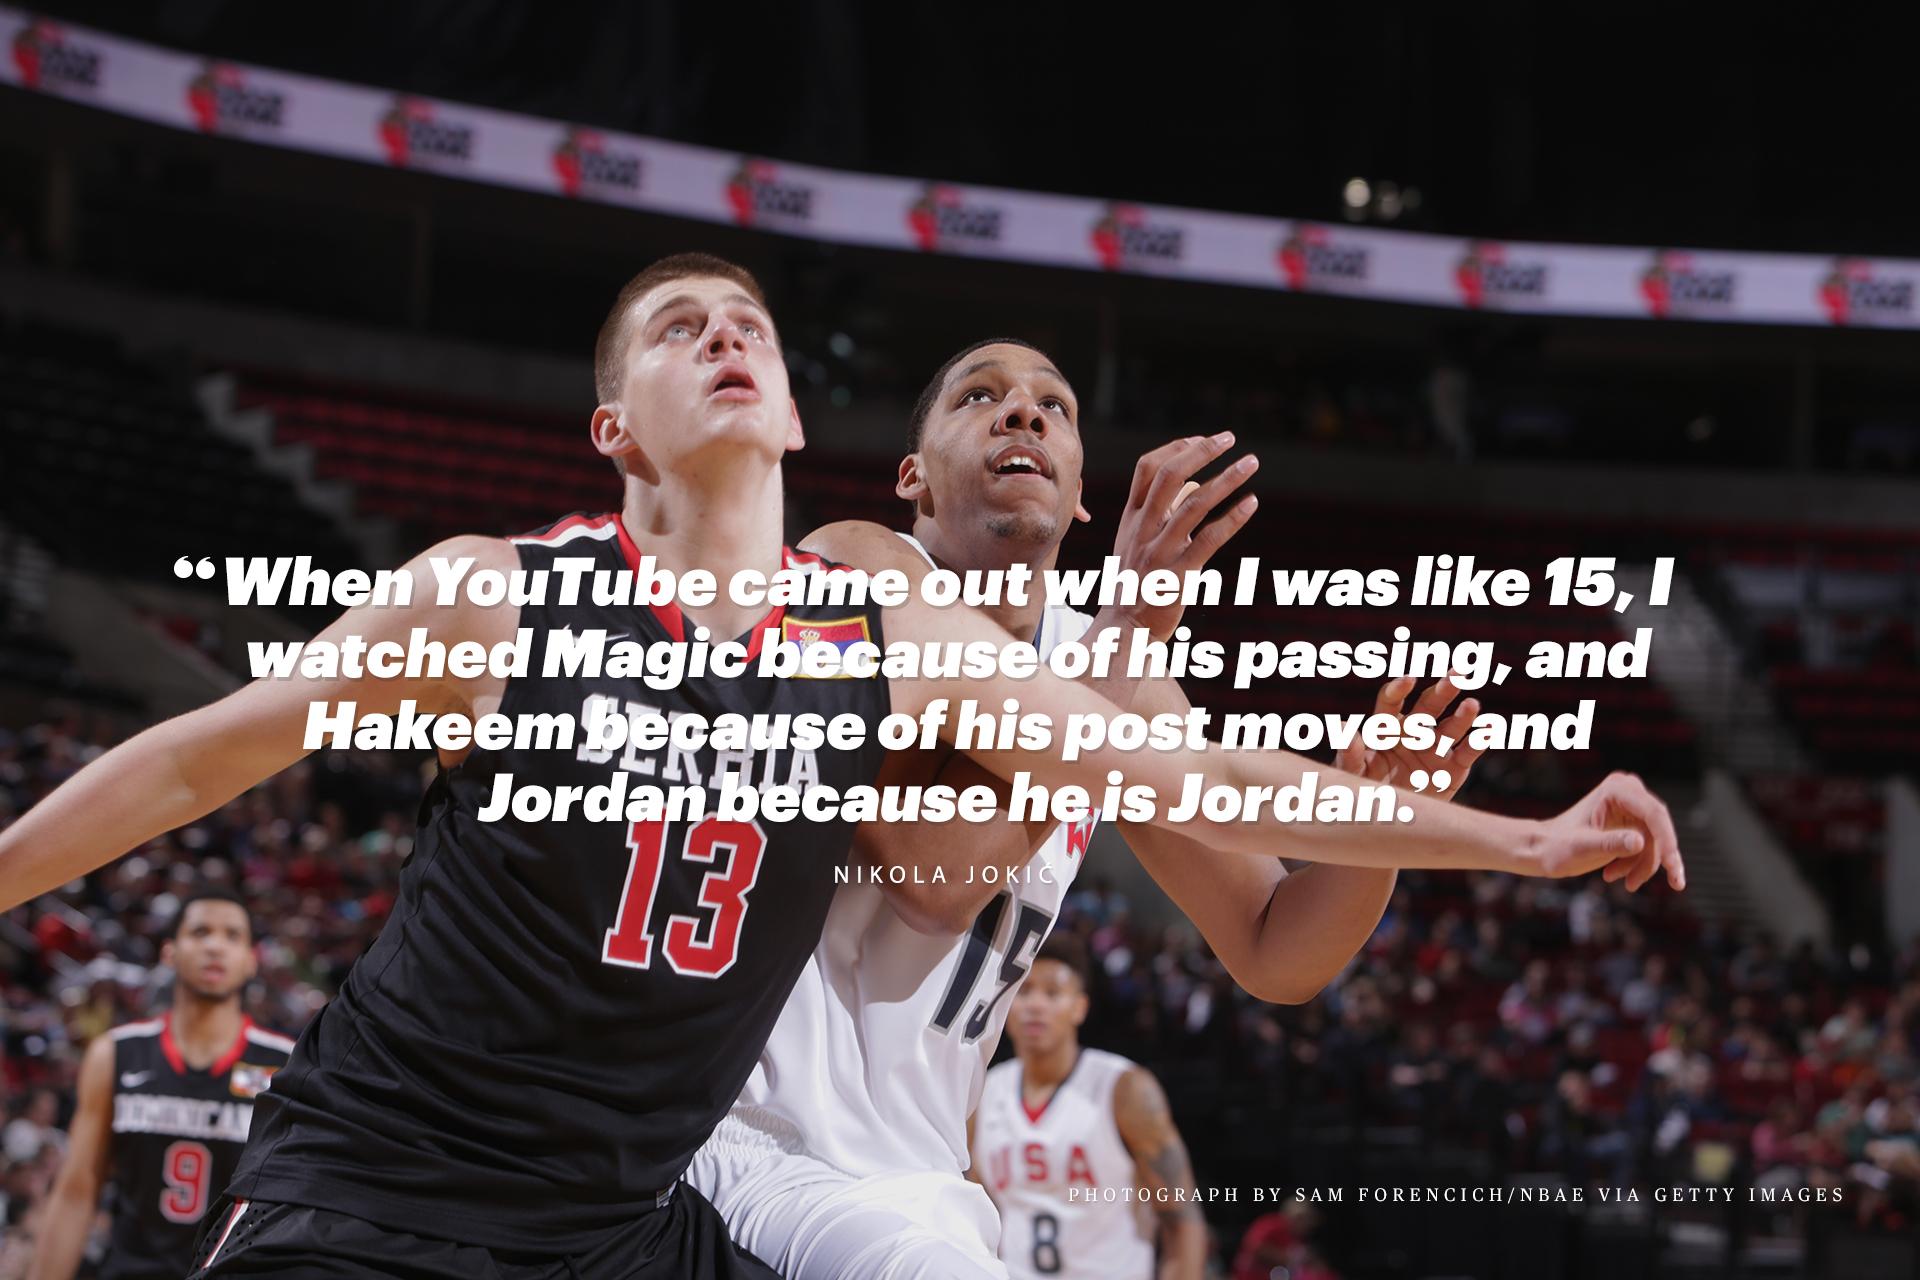 Jokic Jordan Pull